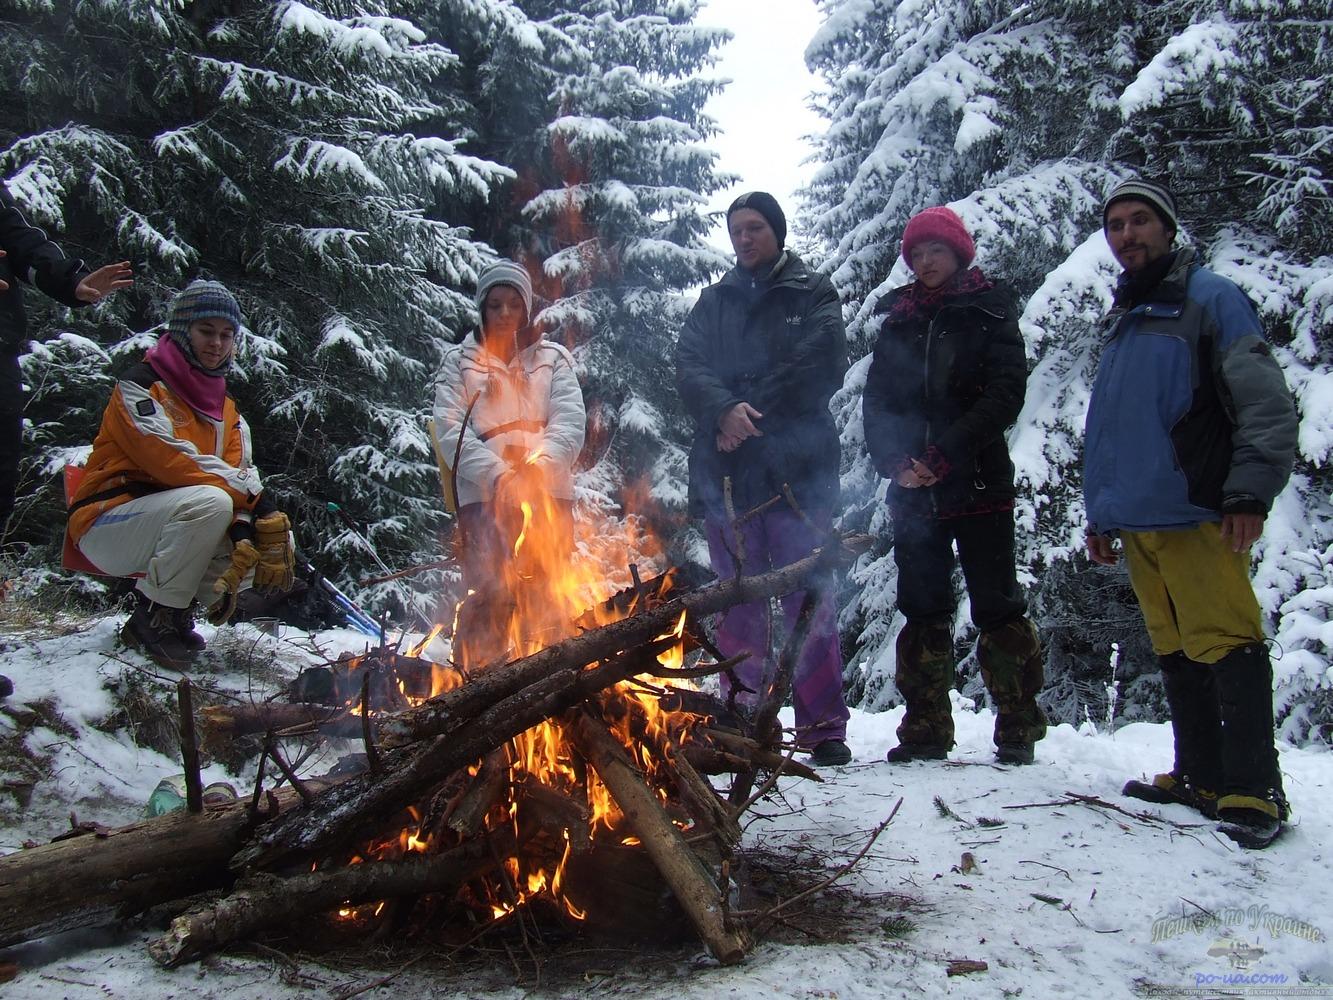 картинки туристов зимой запросу